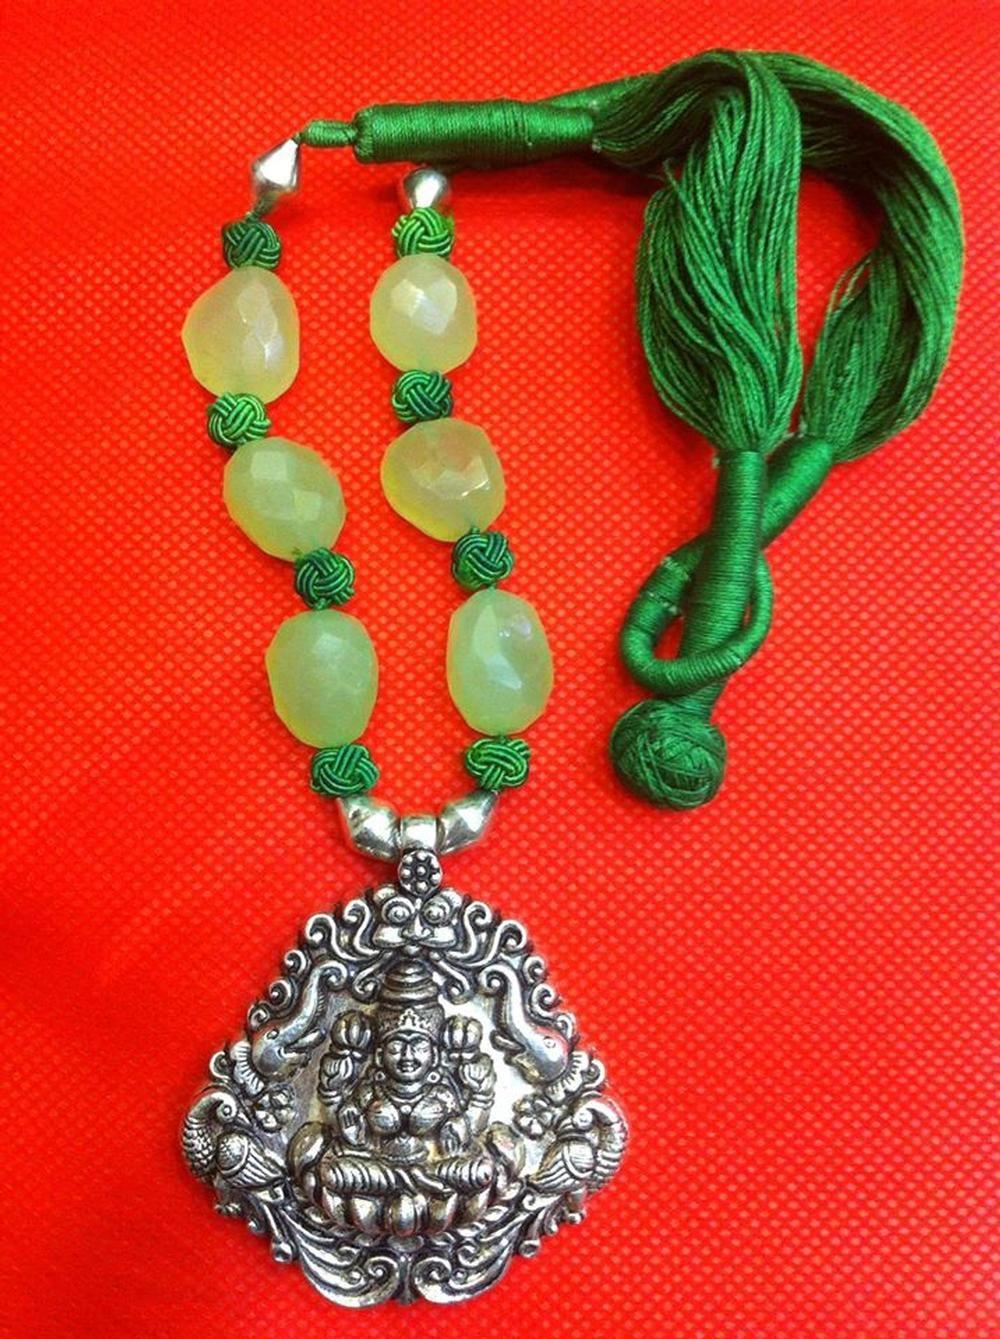 Gajalakshmi Temple Pendant in Green Chalcedony Necklace